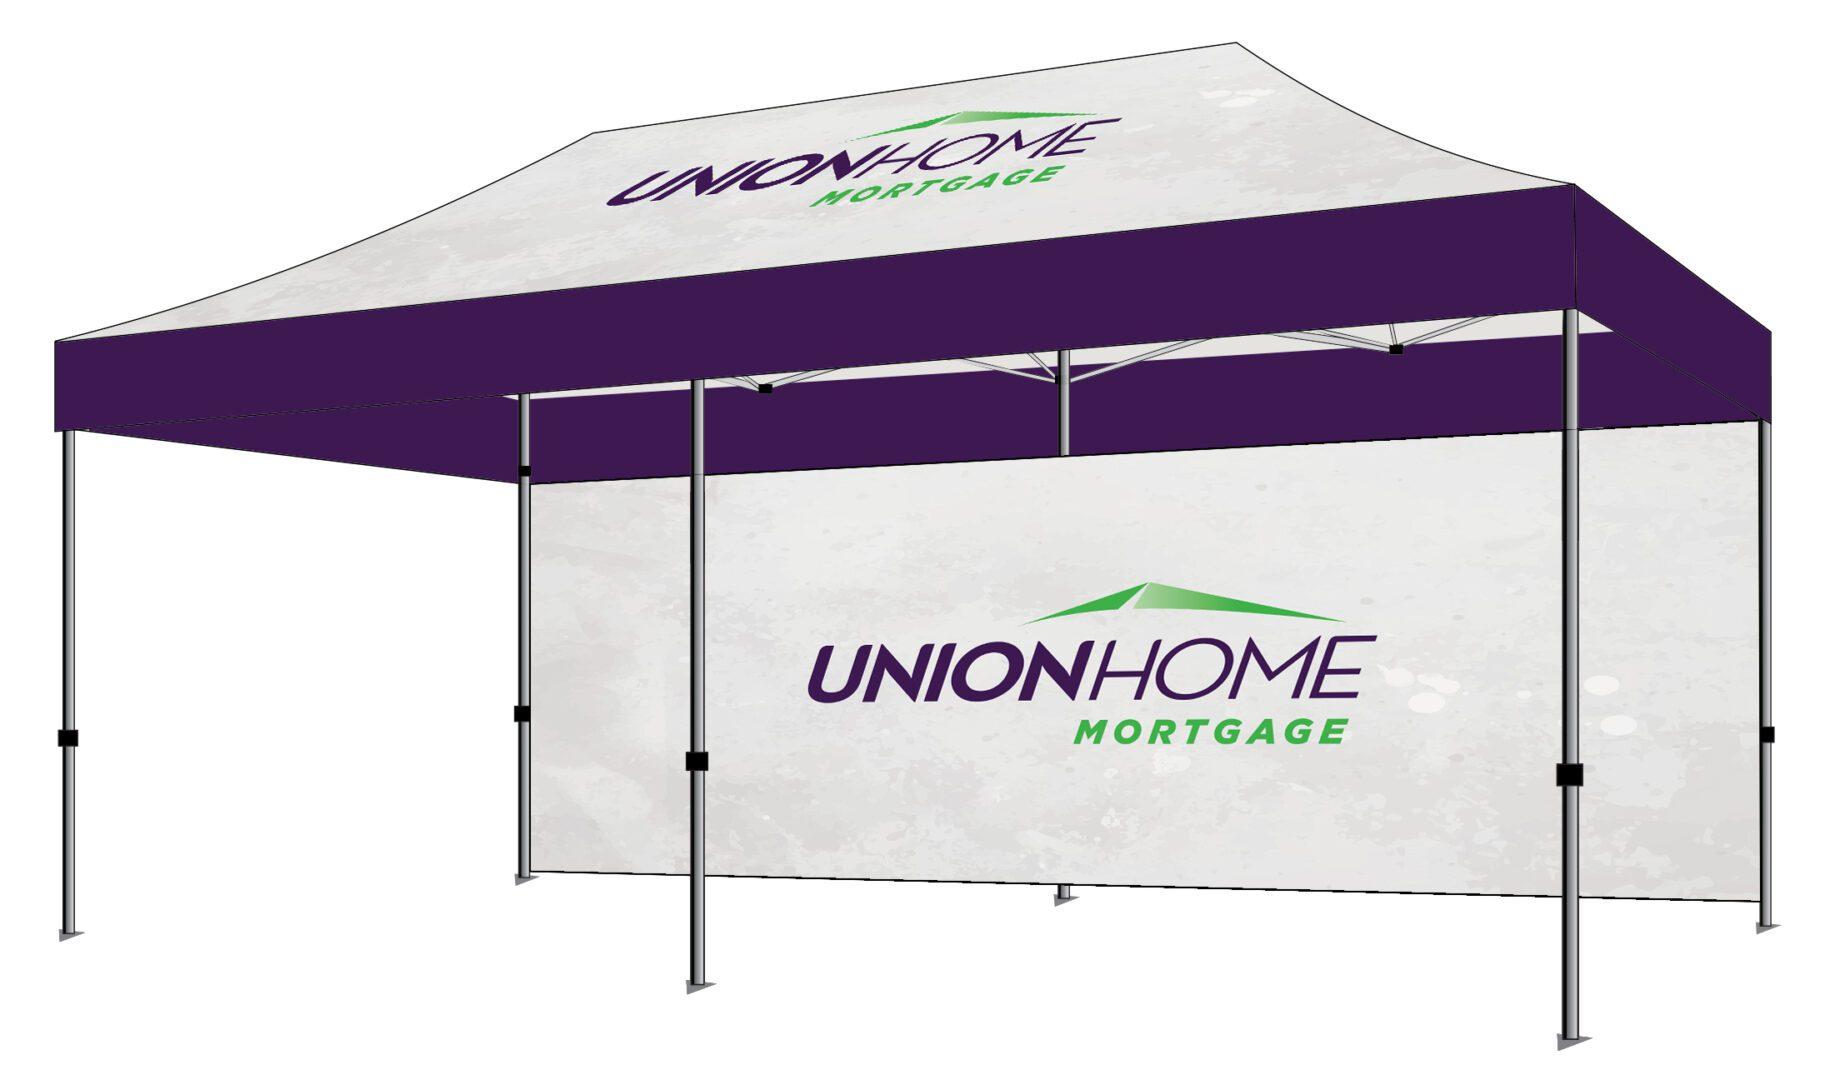 UnionHome Mortgage Canopy